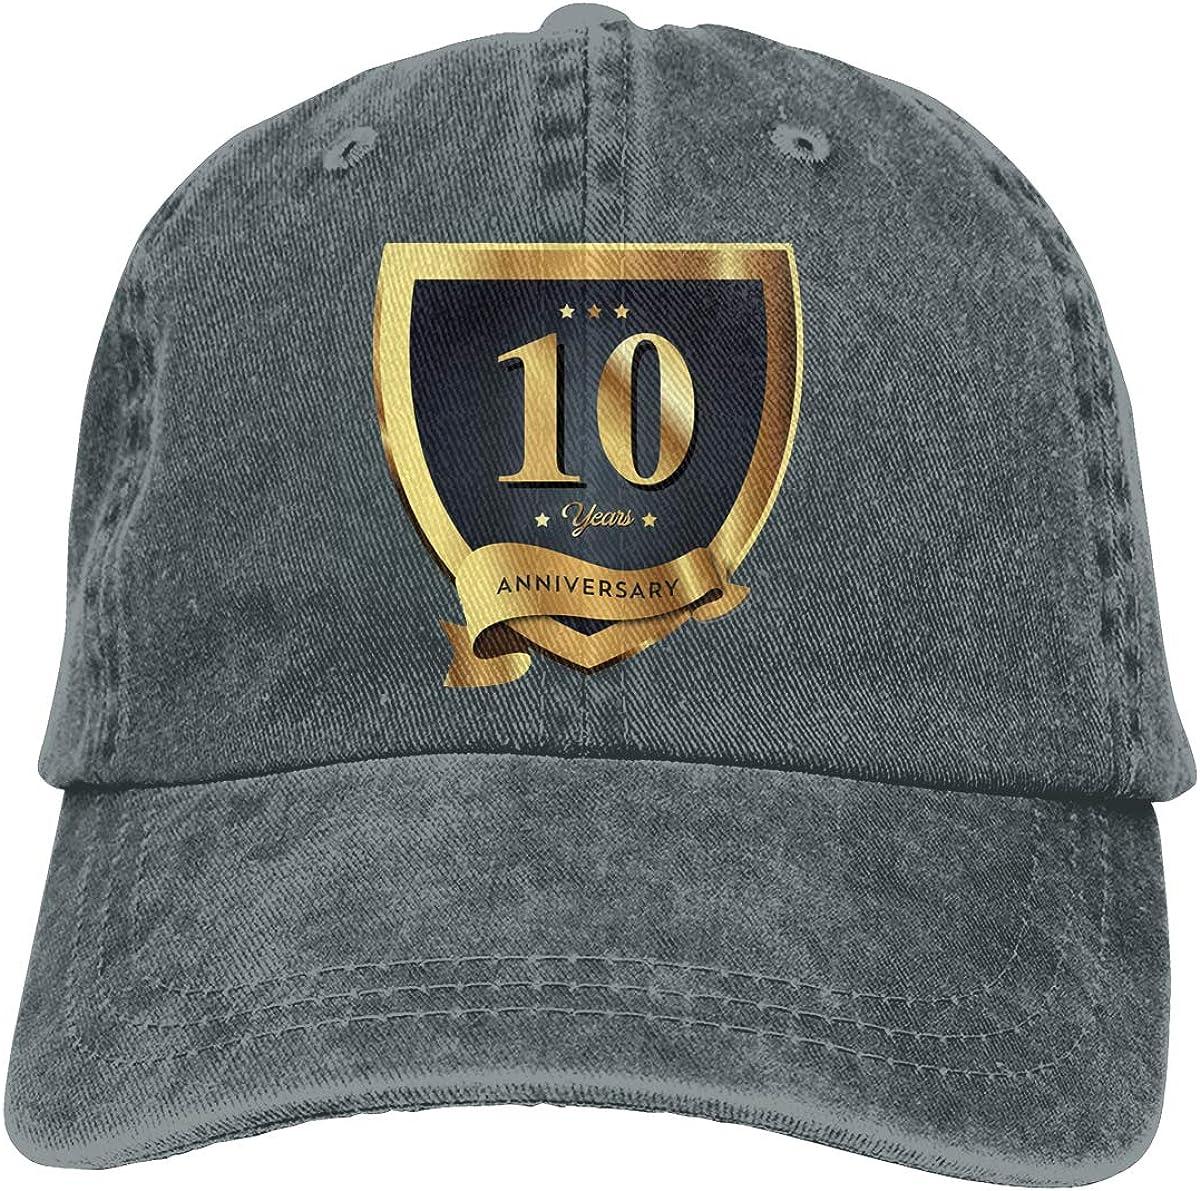 10th Anniversary Baseball Cap Unisex Adjustable Vintage Washed Denim USA